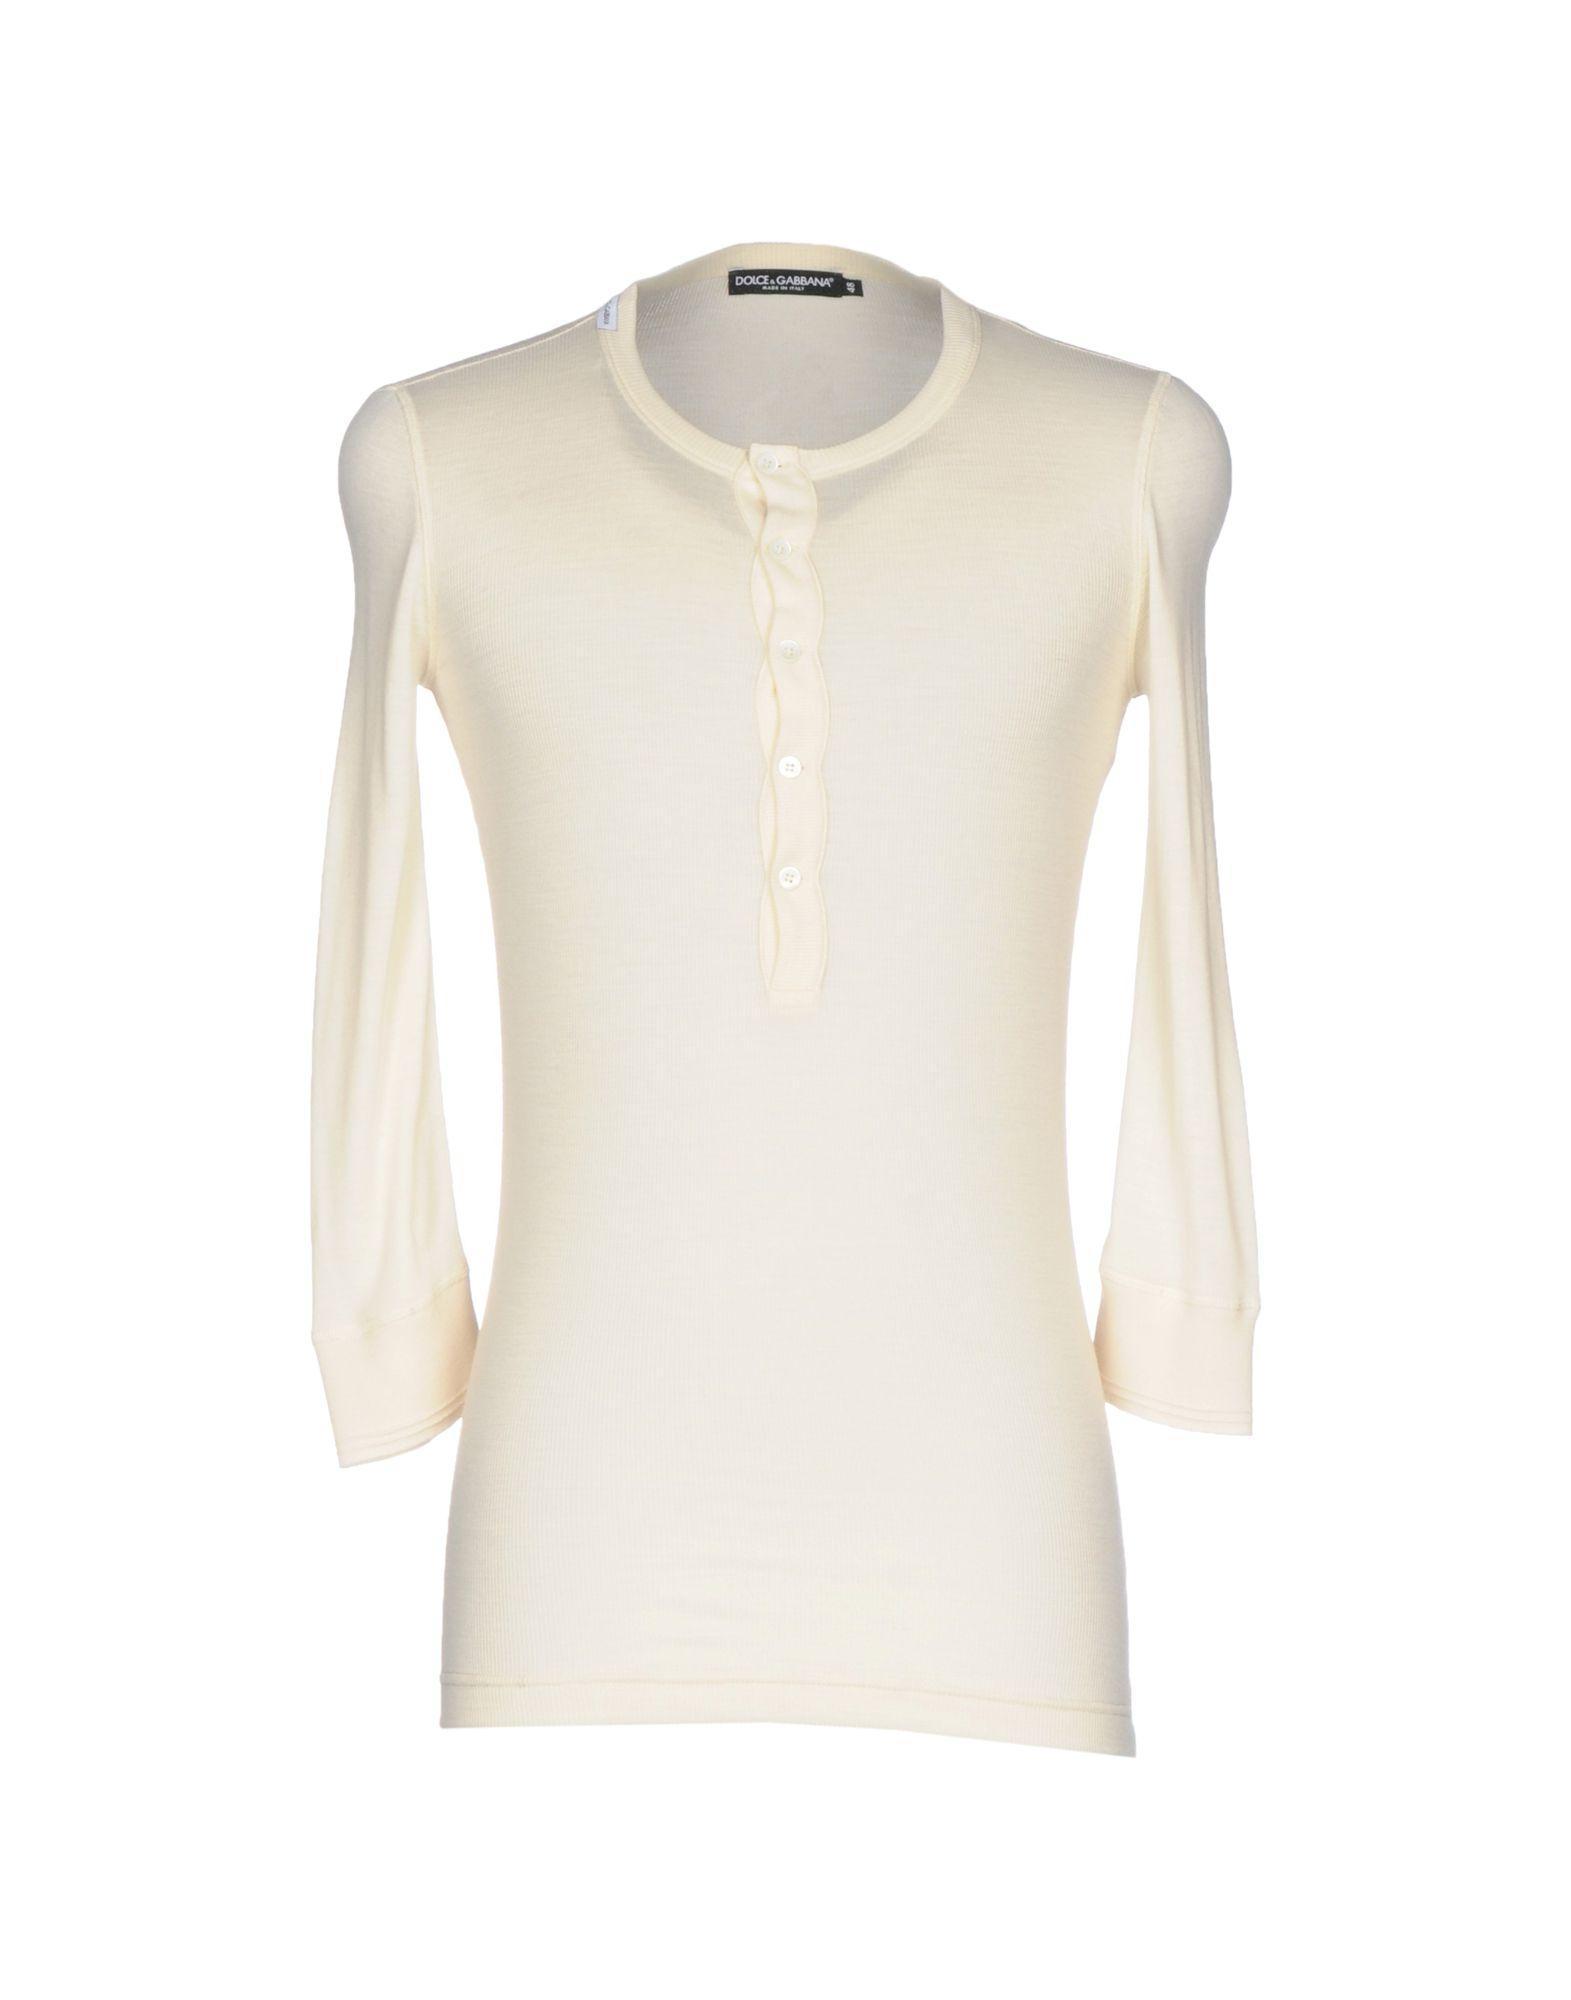 Lyst dolce gabbana t shirt in natural for Dolce gabbana t shirt women